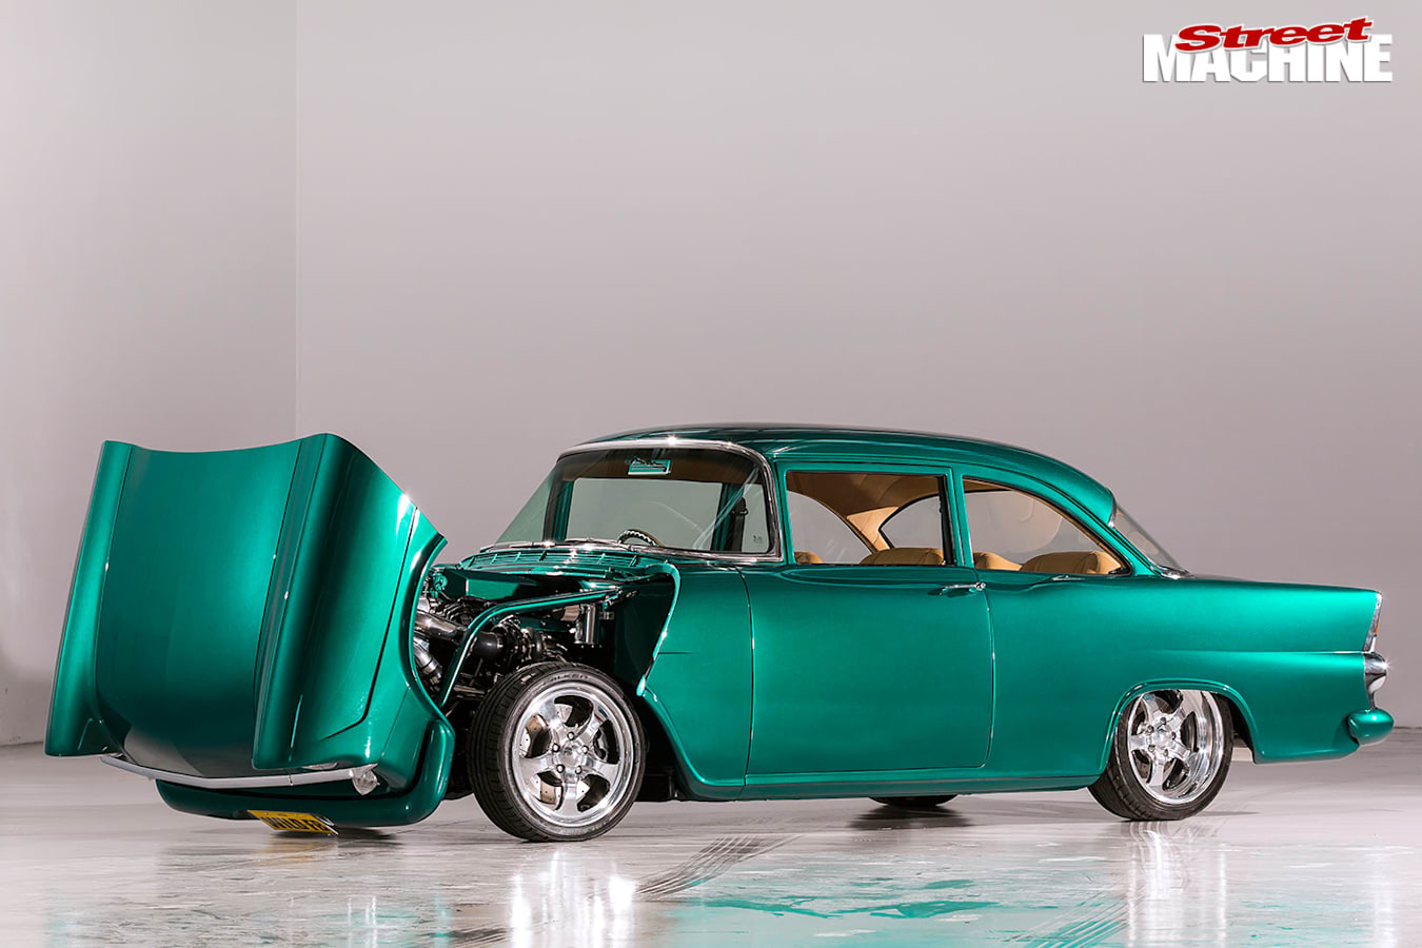 Holden FB bonnet up